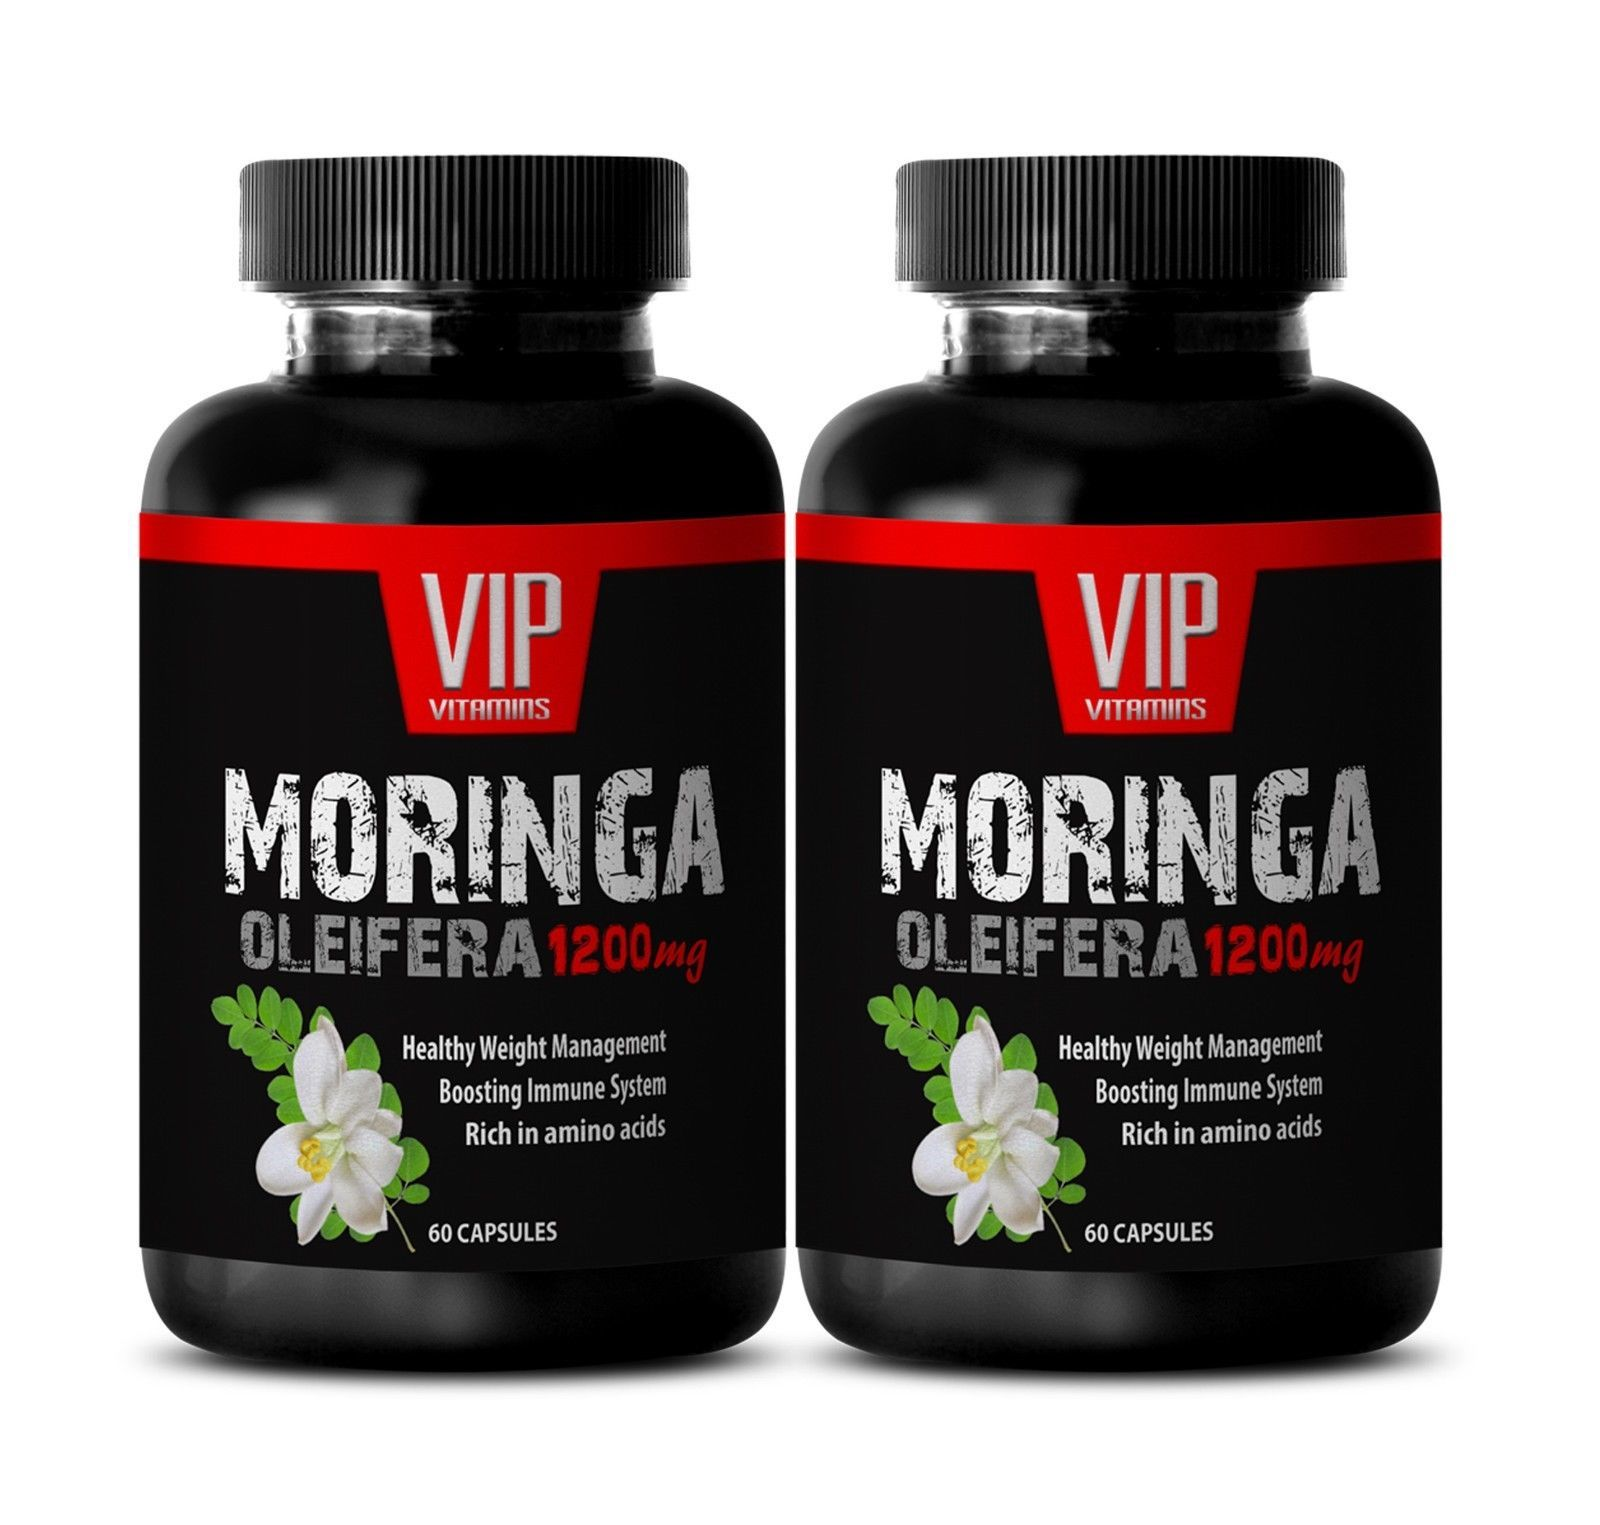 brain and memory - MORINGA OLEIFERA 1200MG - moringa root capsules - 2 Bottles - $22.40